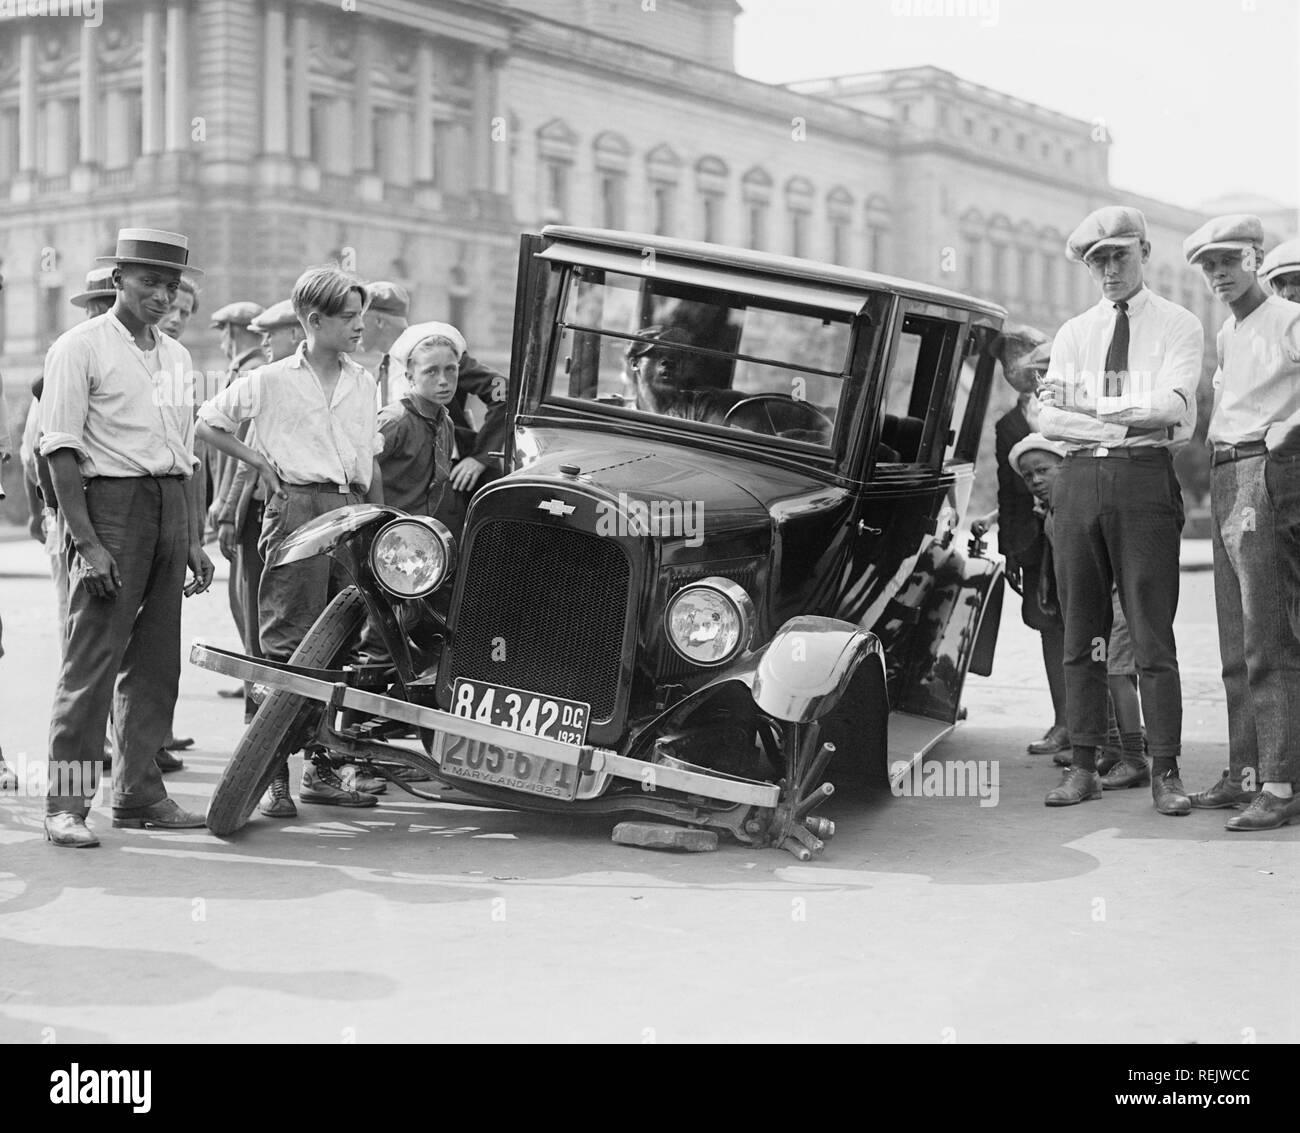 1920s Car Accident Stock Photos & 1920s Car Accident Stock